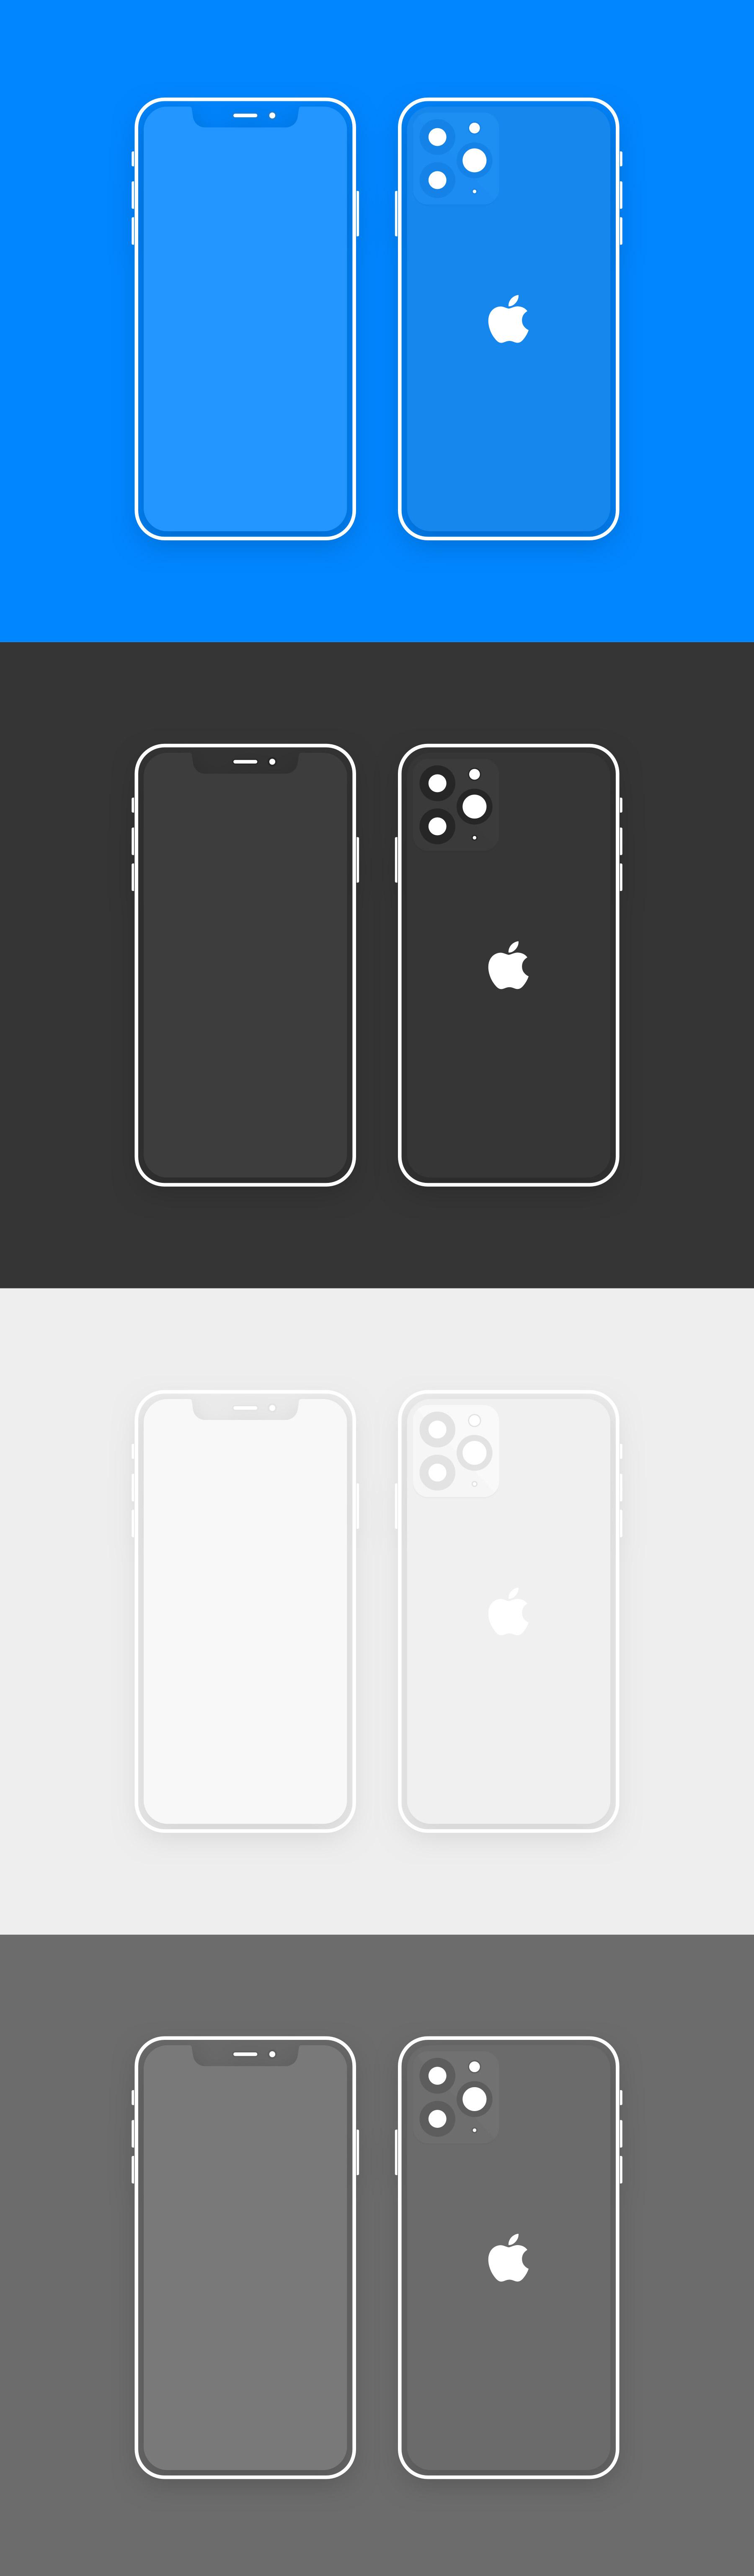 iPhone 11 Pro 线框模型.sketch素材下载 样机素材-第1张